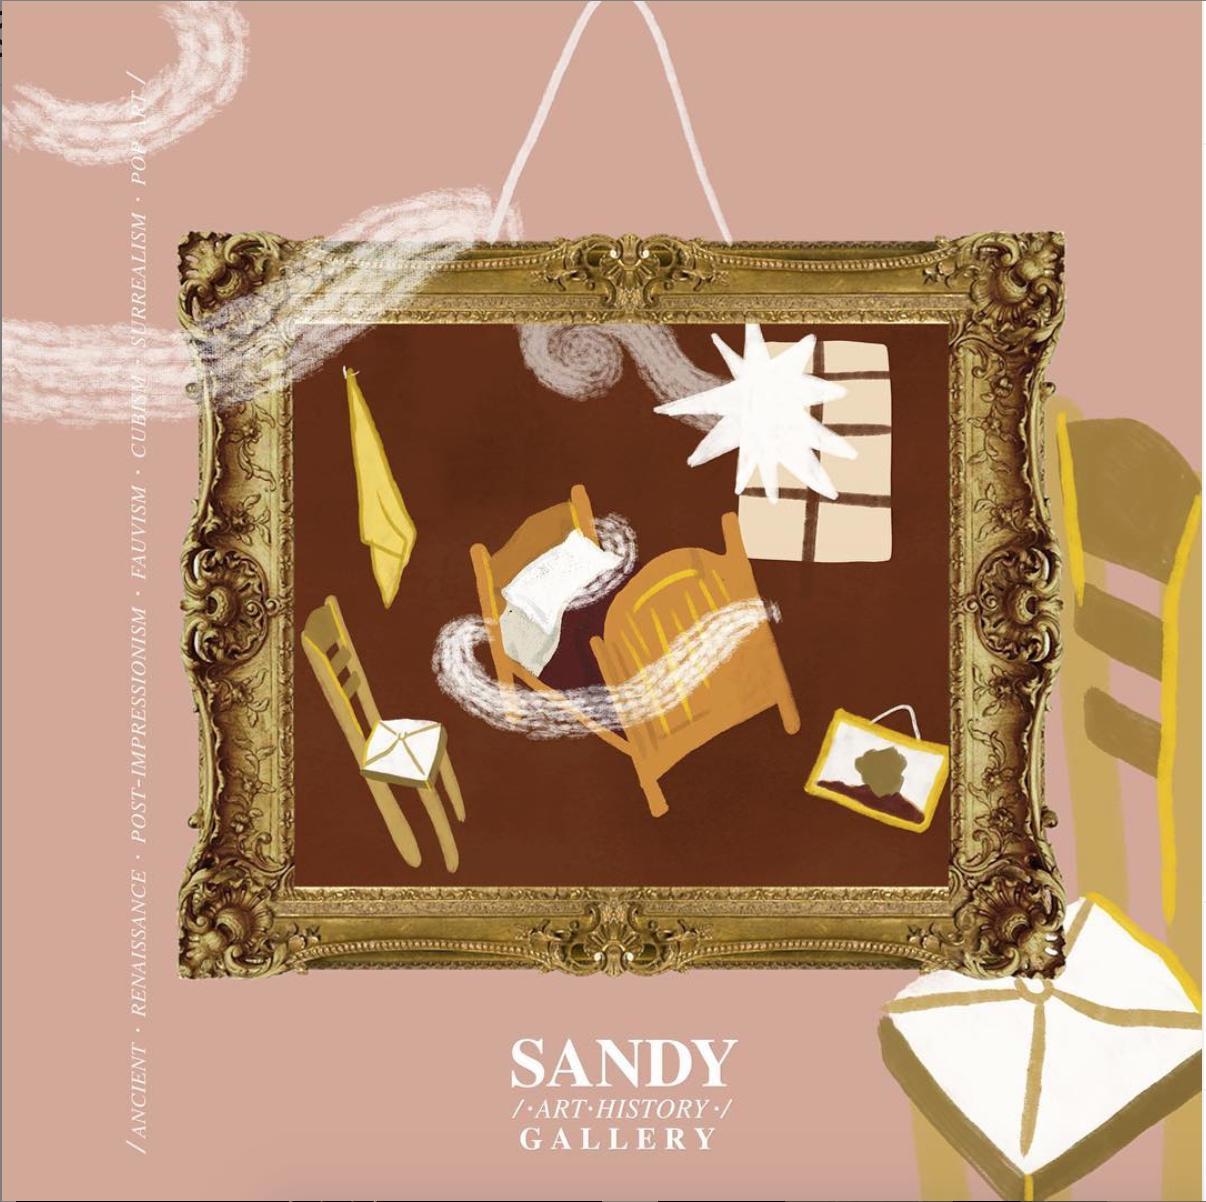 SANDY Art History Gallery